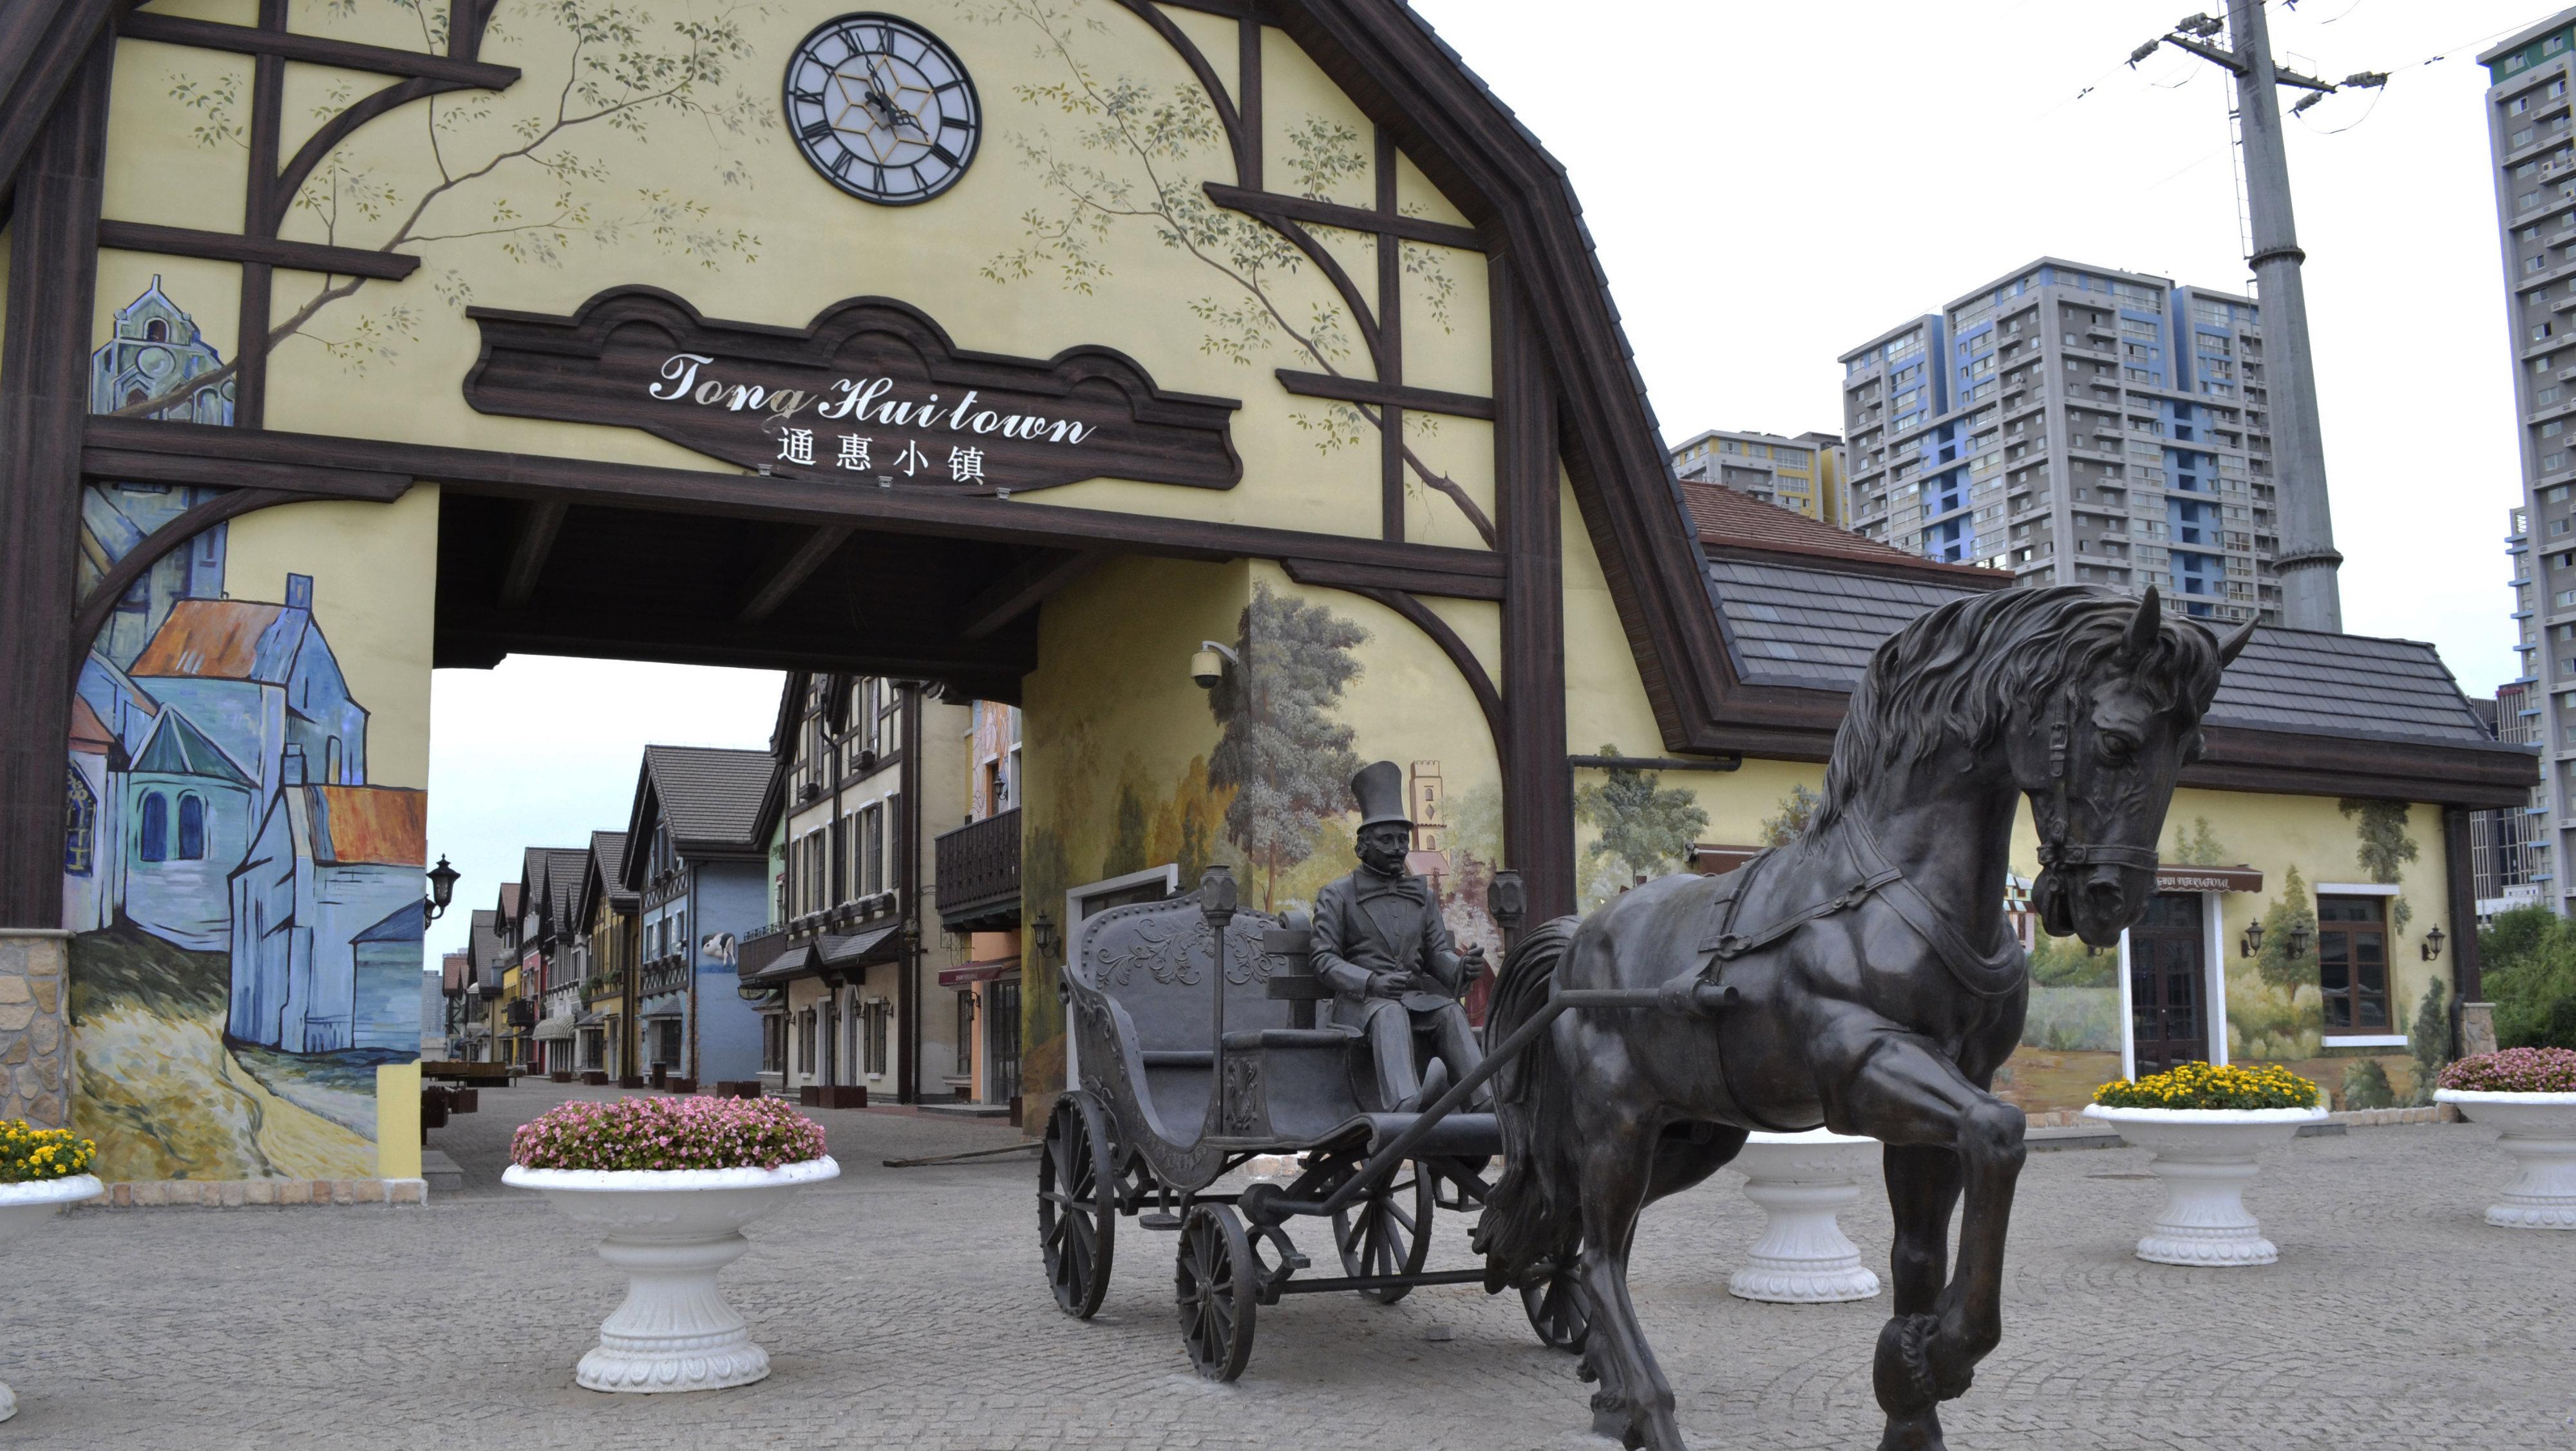 Entrance to Tonghui